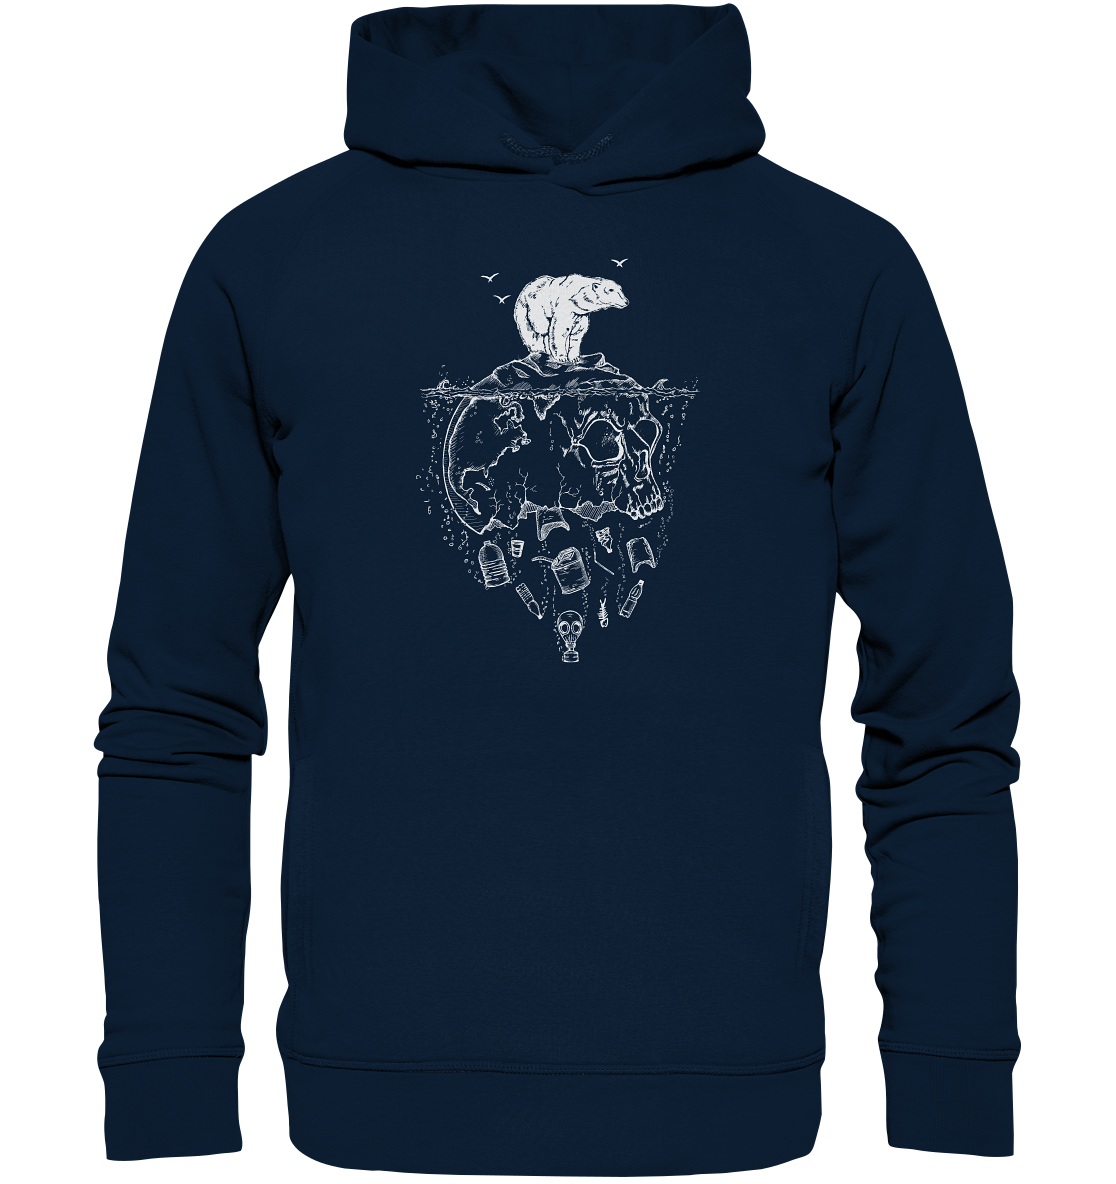 front-organic-fashion-hoodie-0e2035-1116x-5.png